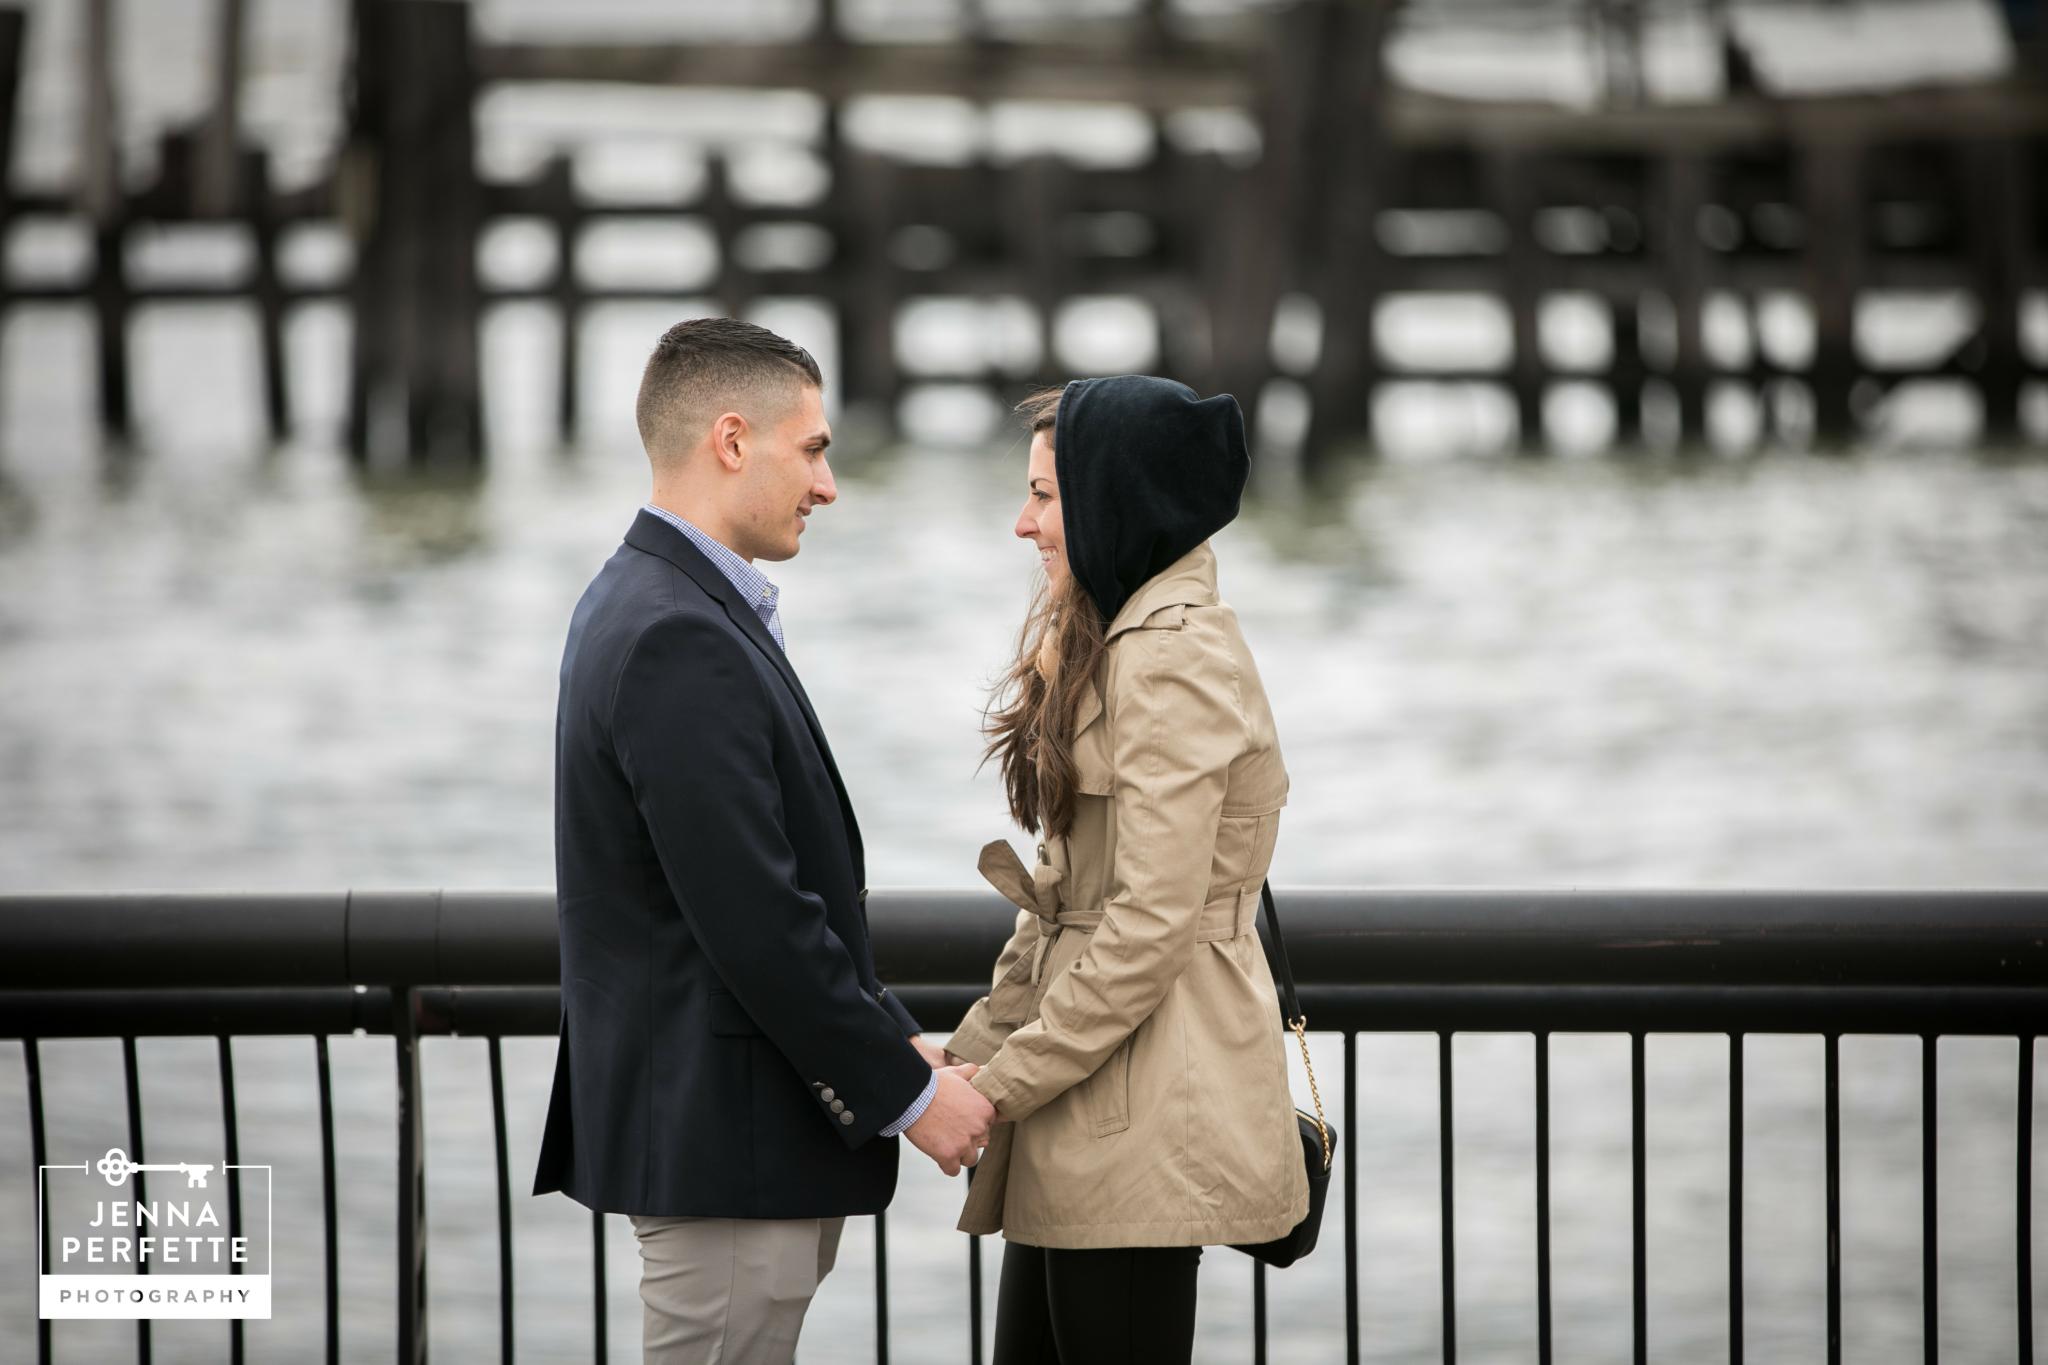 Hoboken Waterfront Proposal Photos Best New Jersey Photographer (1)